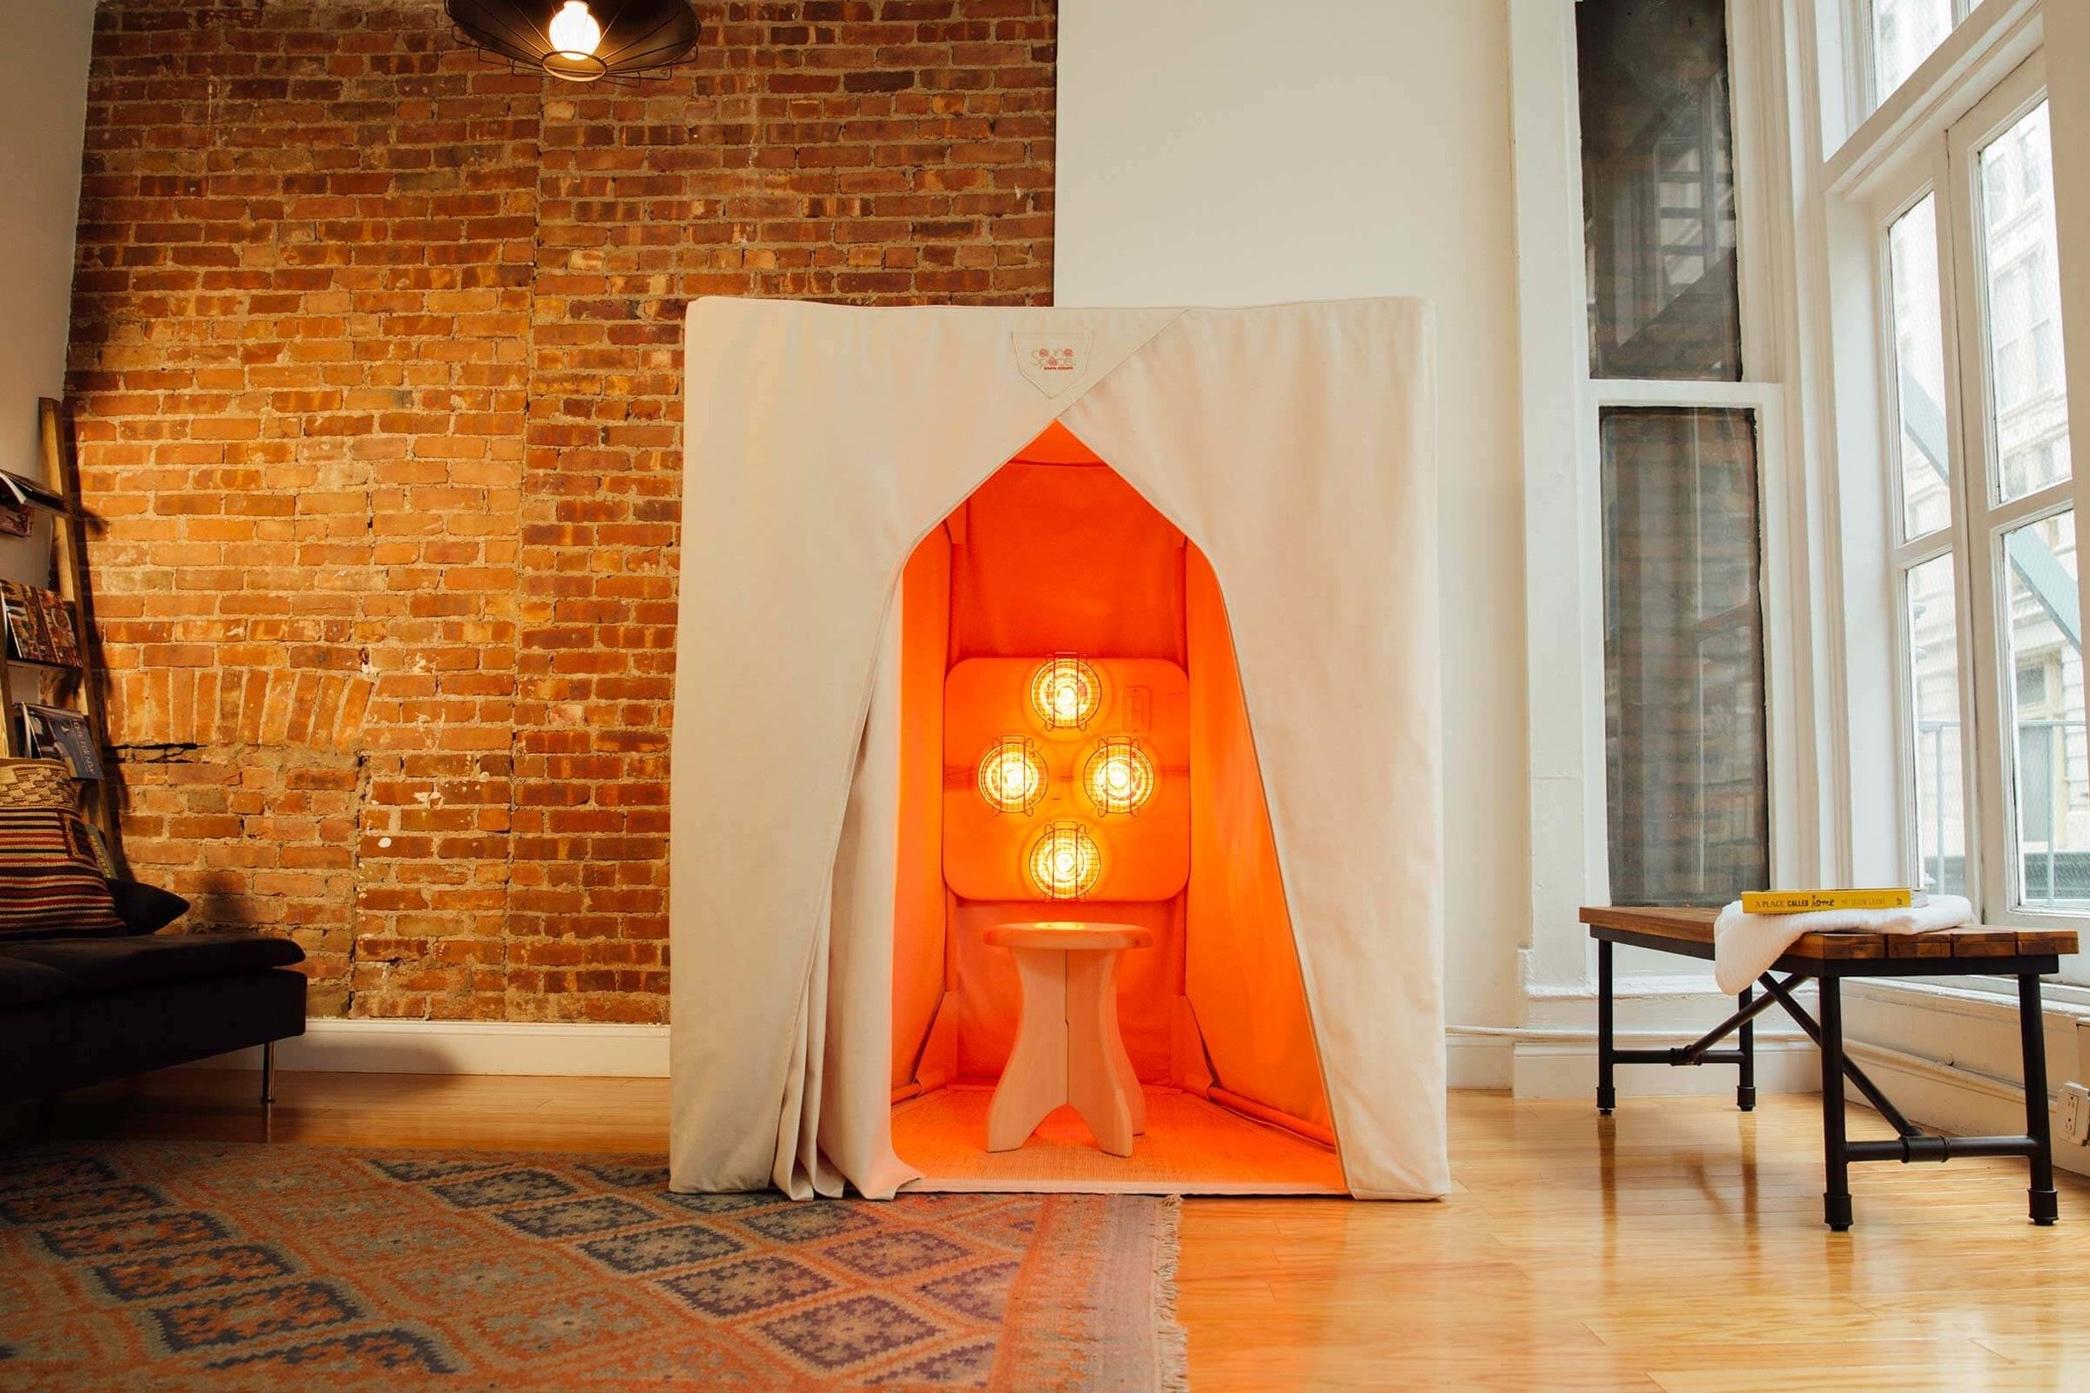 SaunaSpace - My favorite sauna for gentle, effective detoxification